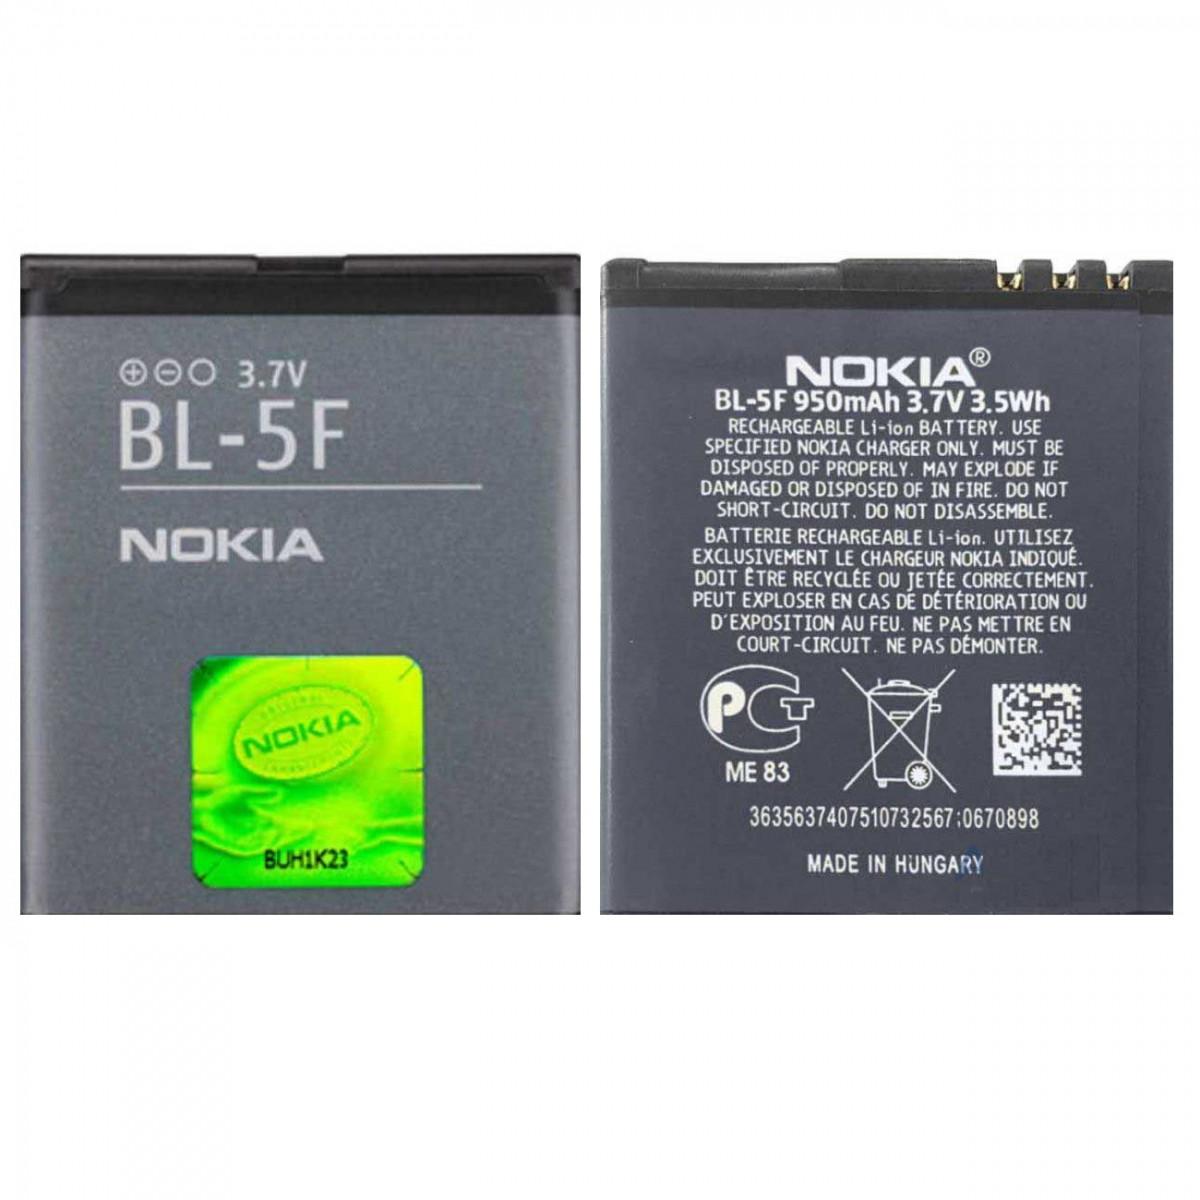 Аккумулятор акб ориг. к-во Nokia BL-5F 6210 | 6210N | 6210S | 6290 | 6710 | E65 | N78 | N79 | N93i | N95 | X5-01, 950mAh